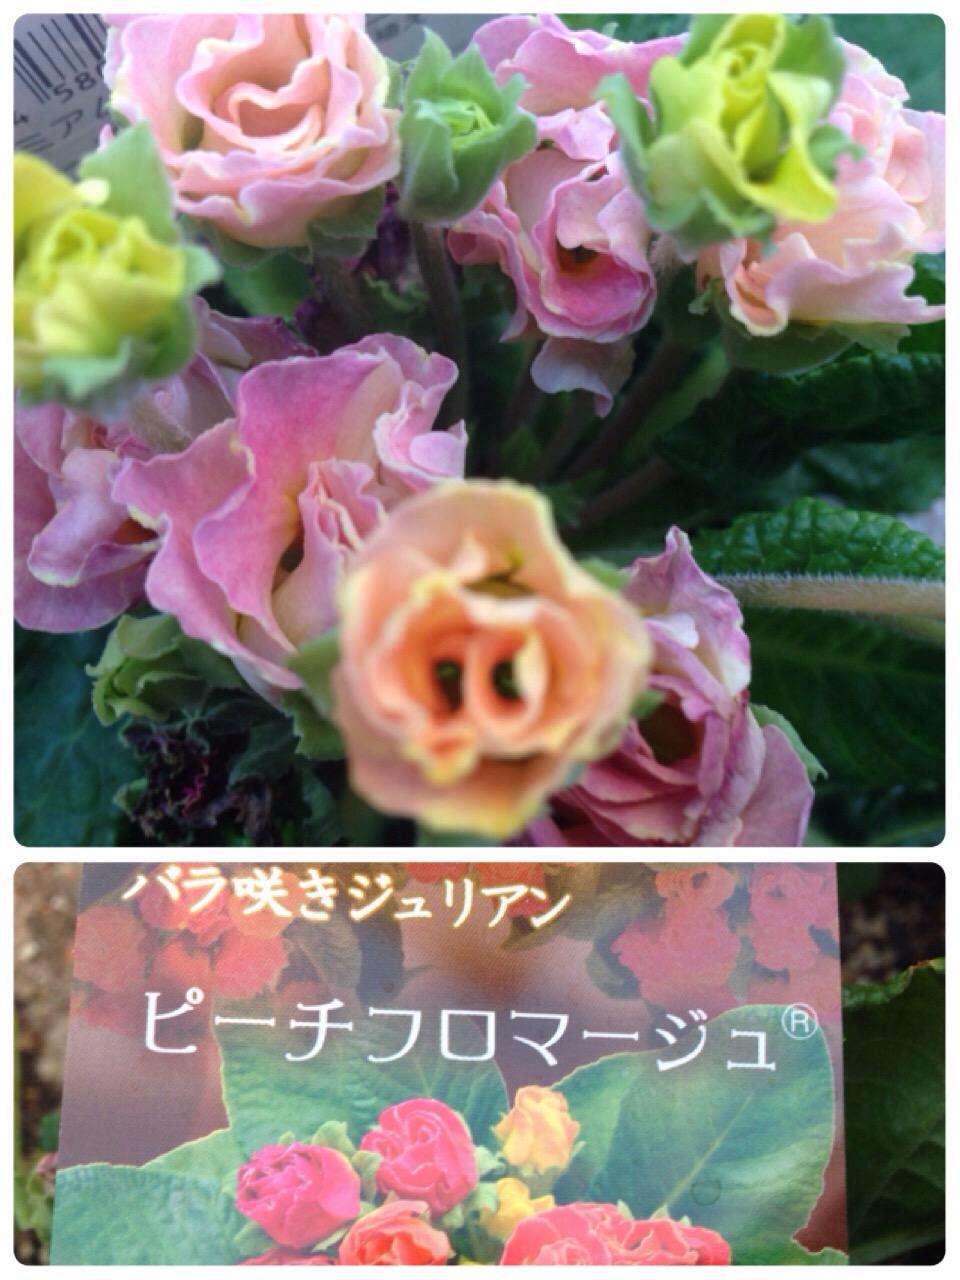 IMG_5943.JPG